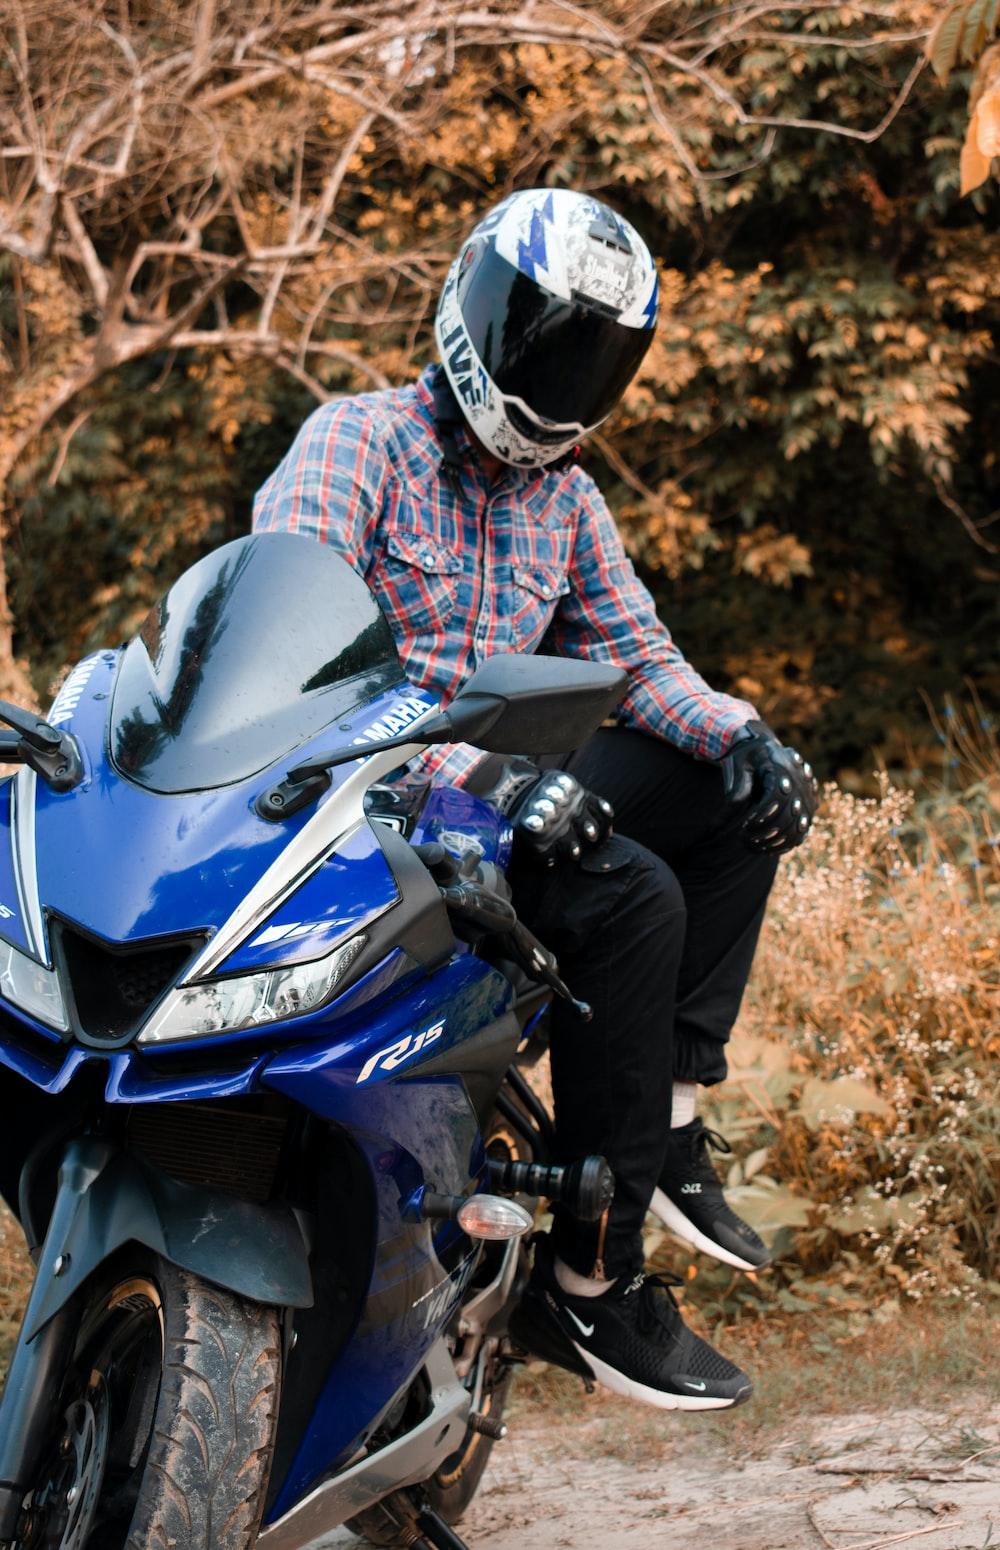 man wearing white helmet sitting on blue sports bike